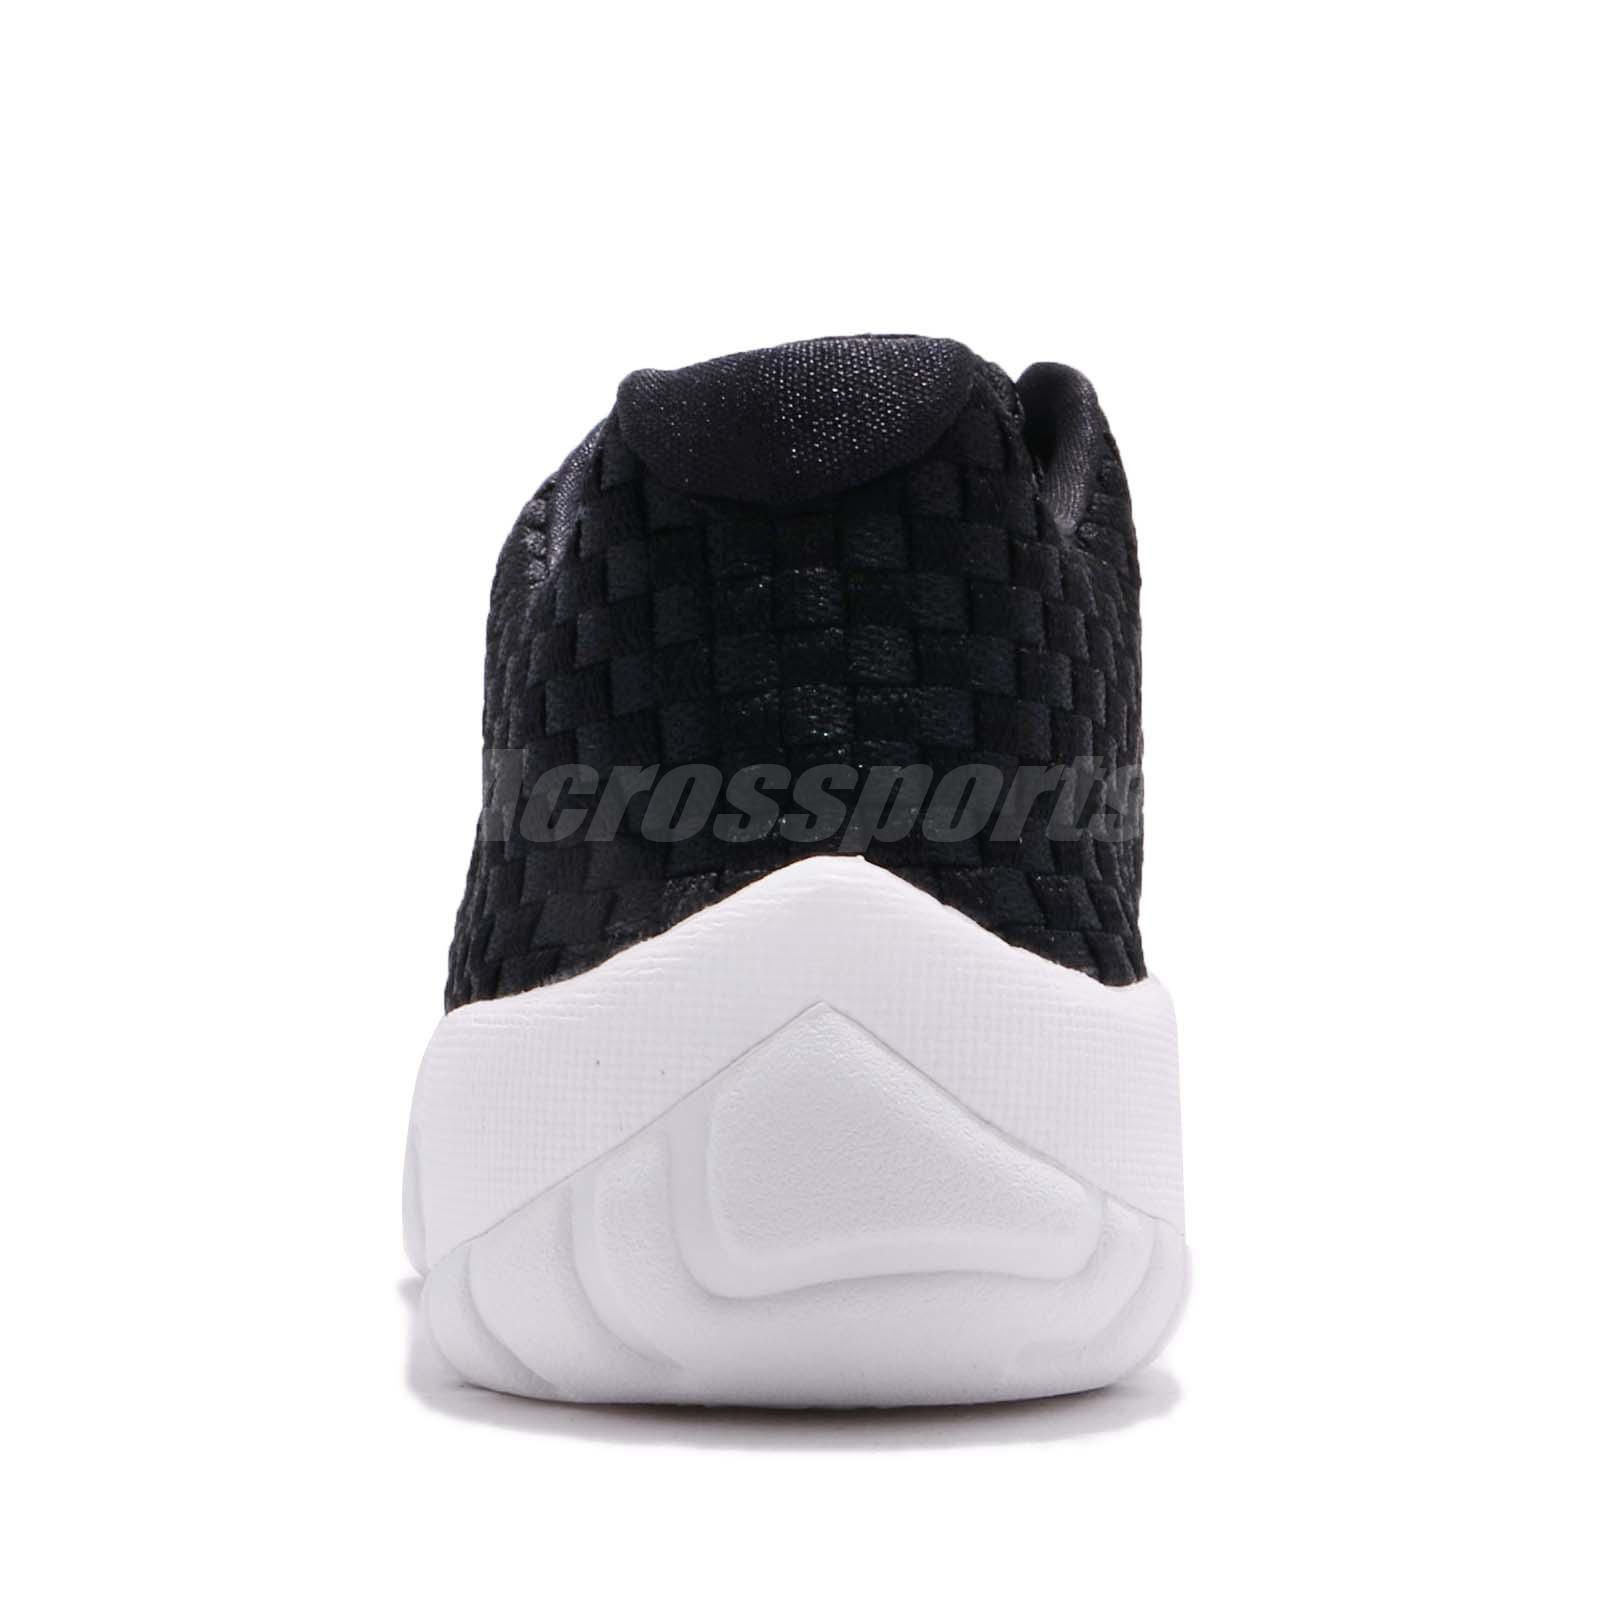 ae395e44982f Nike Air Jordan Future Low Black White Men Lifestyle Shoes Sneakers ...